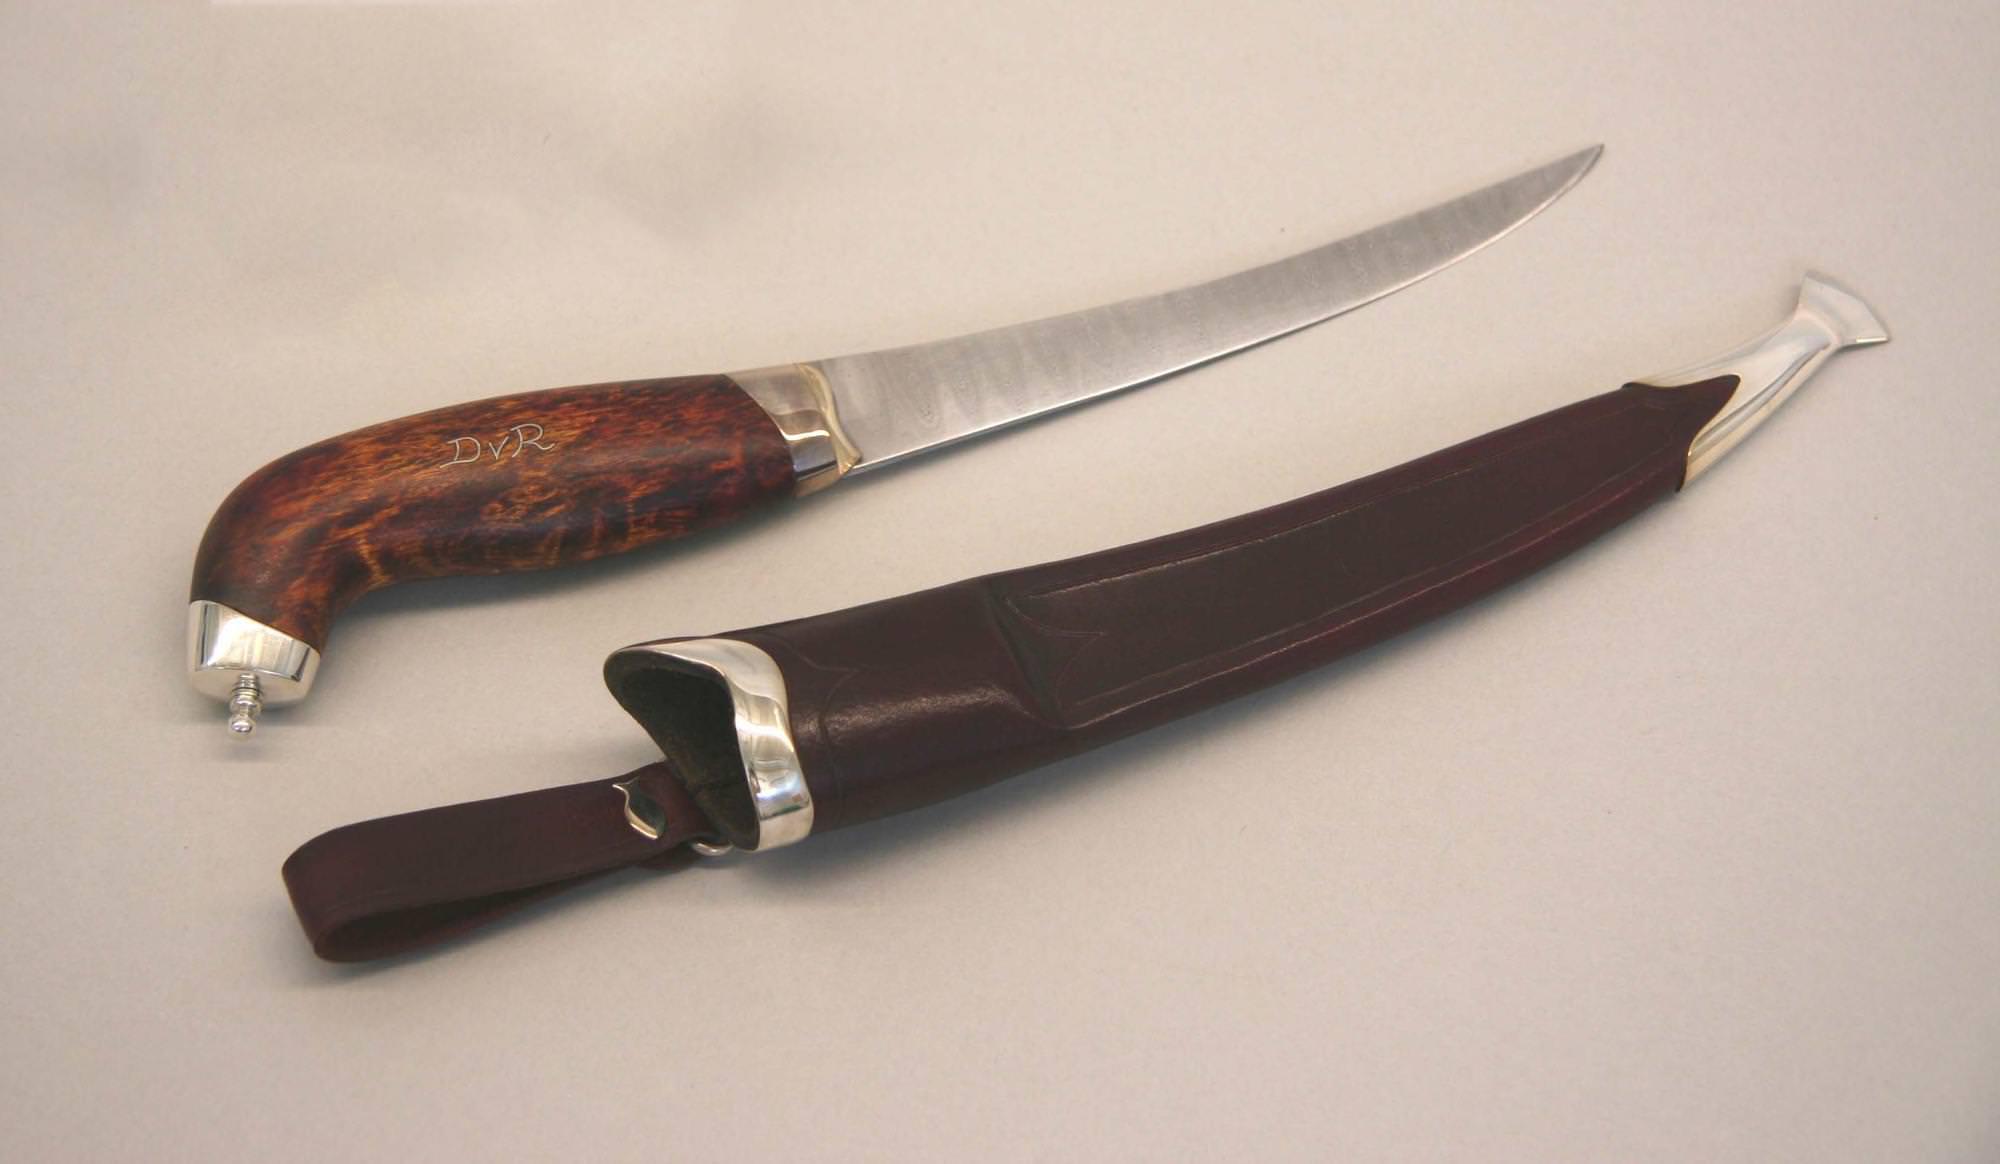 Silver fish-fillet knife © 2007 Spencer Ritzen Silver fish-fillet knife © 2007 Spencer Ritzen